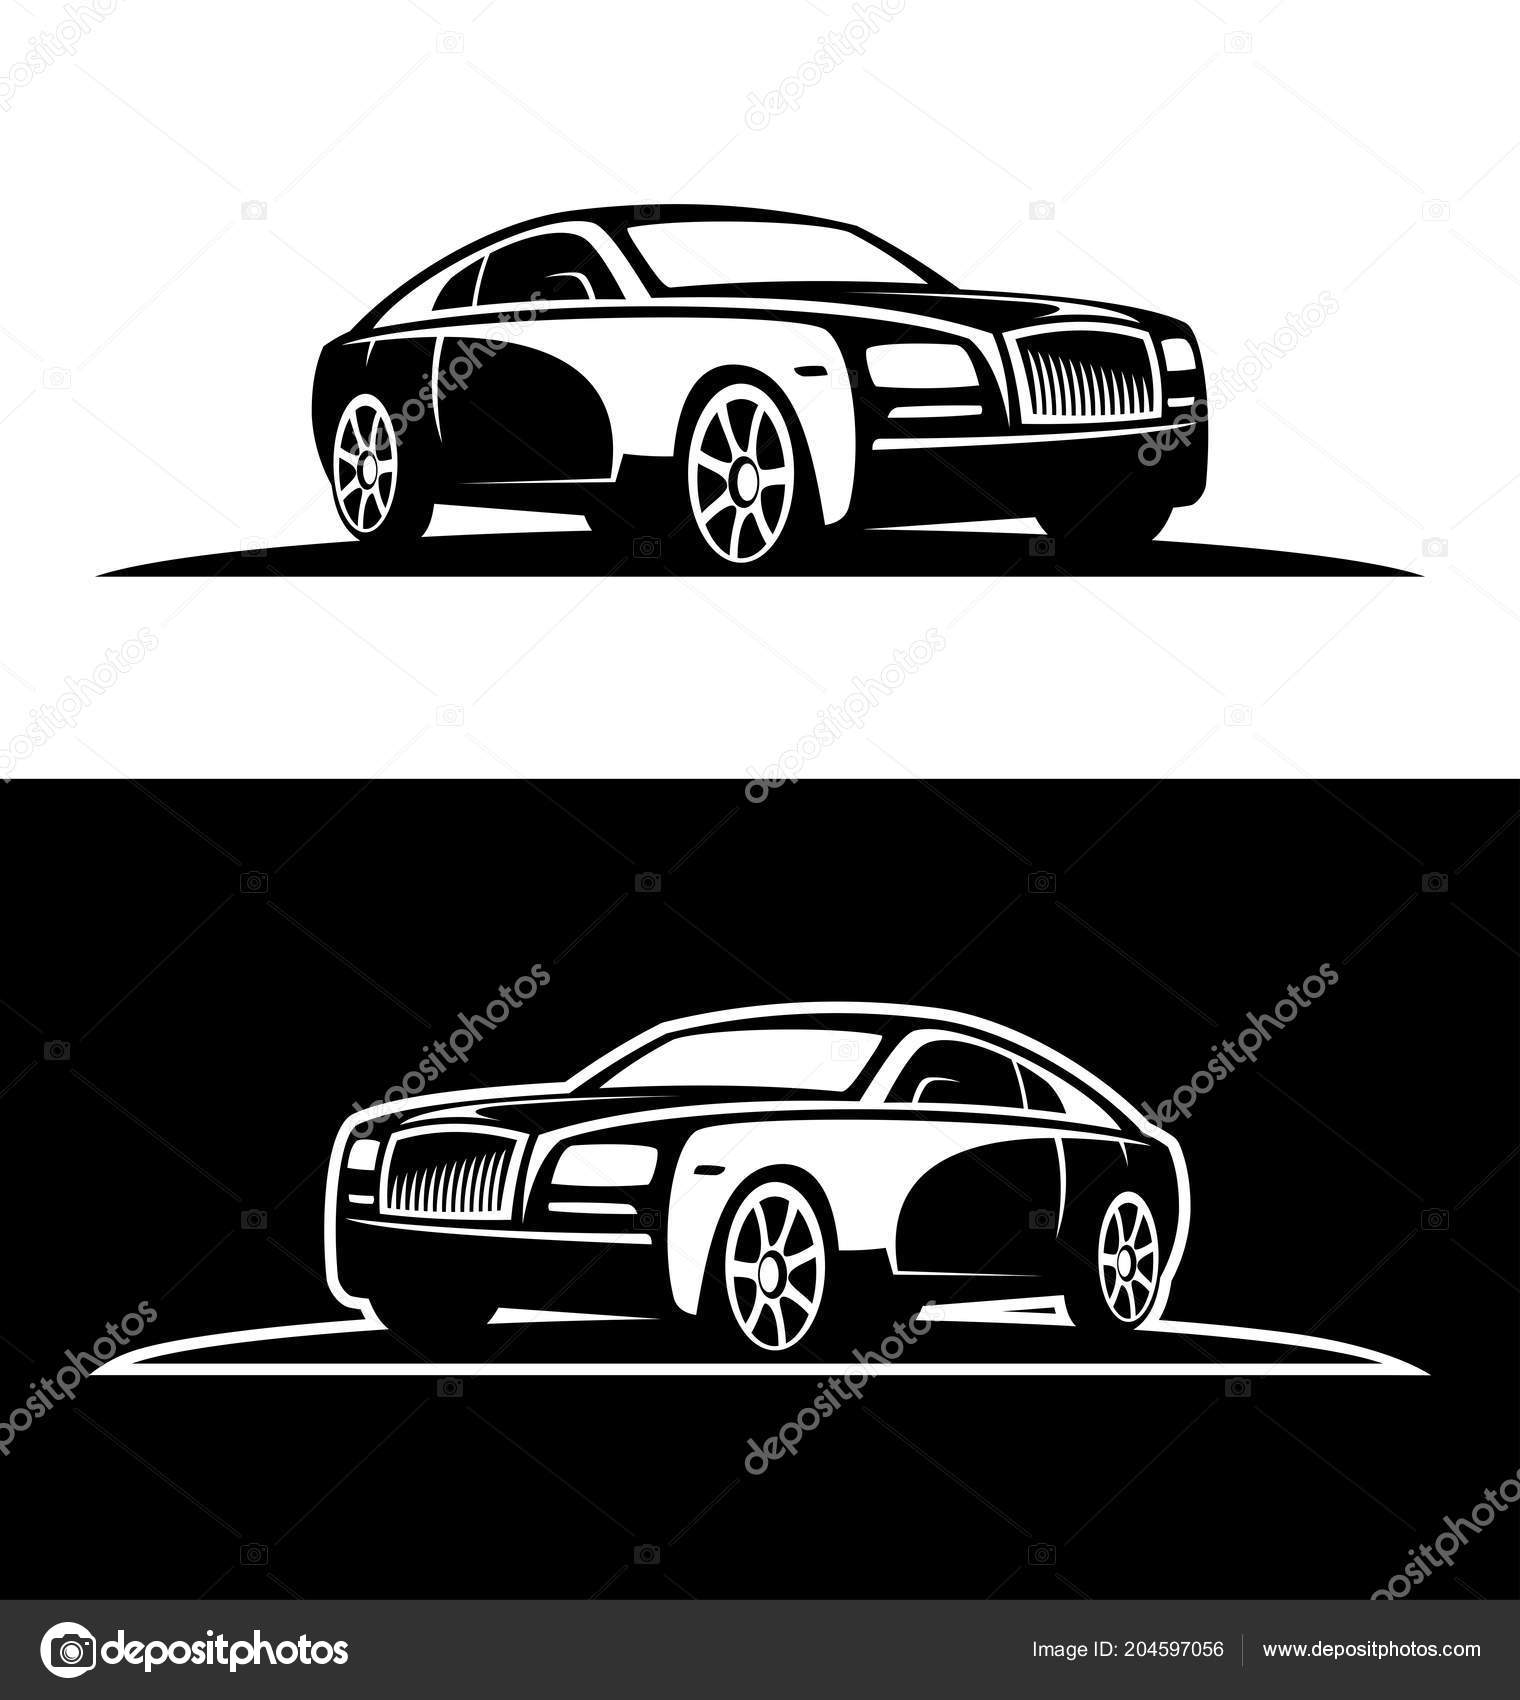 Luxury Car Silhouette Stock Vector C Gala Che 204597056